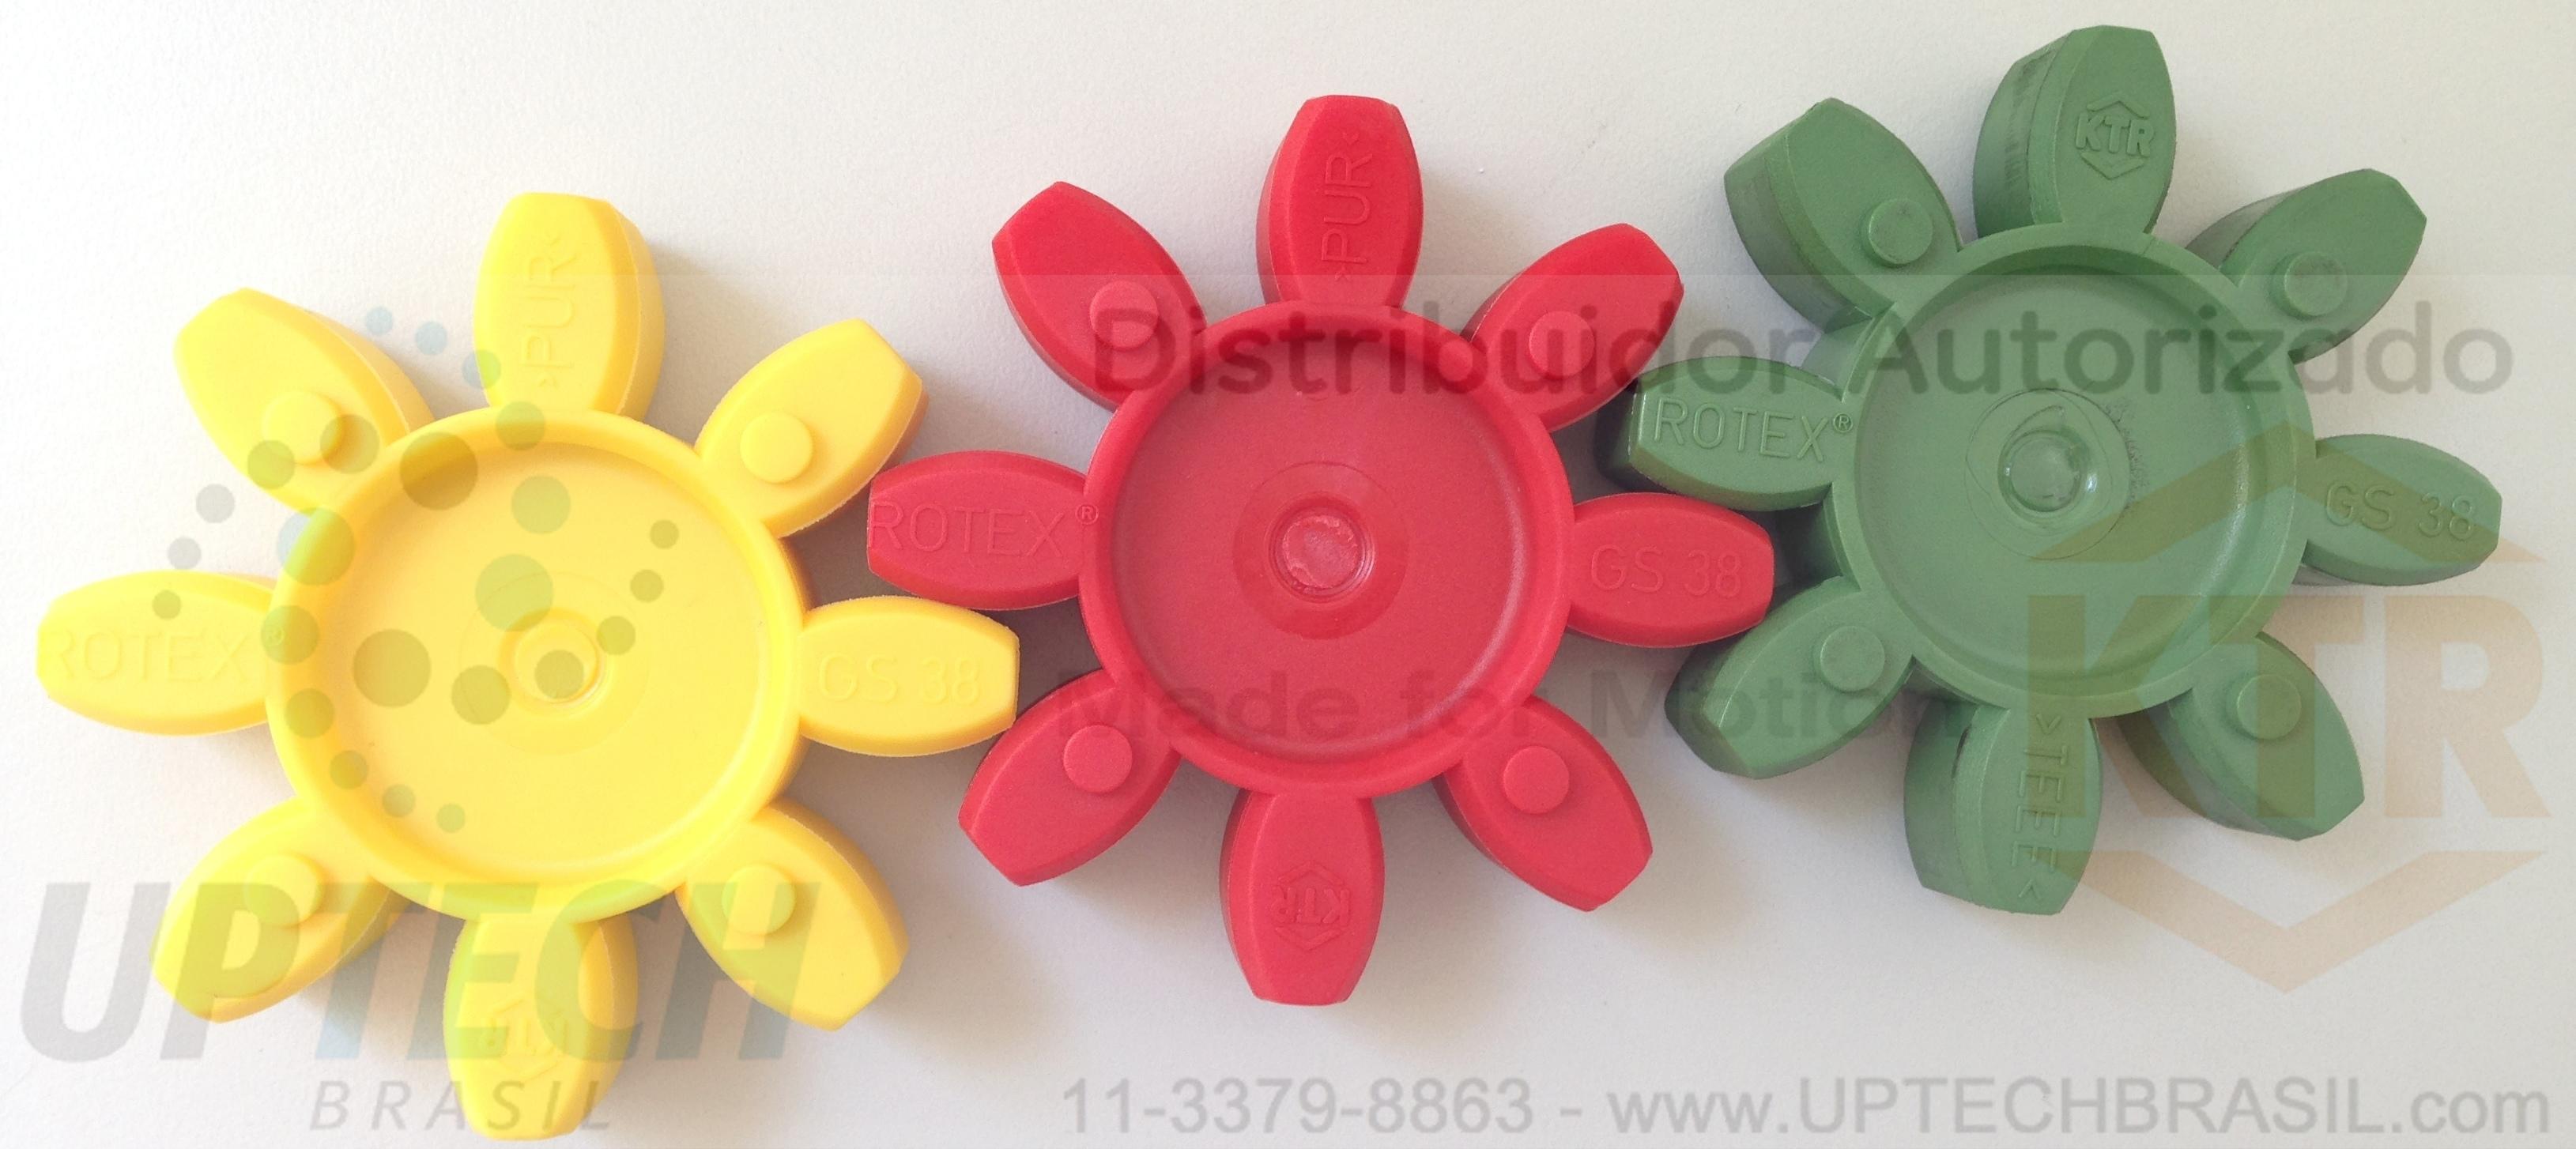 ELASTÔMERO ROTEX® GS - 3 durezas (92 ShA, 98 ShA e 64 ShD)